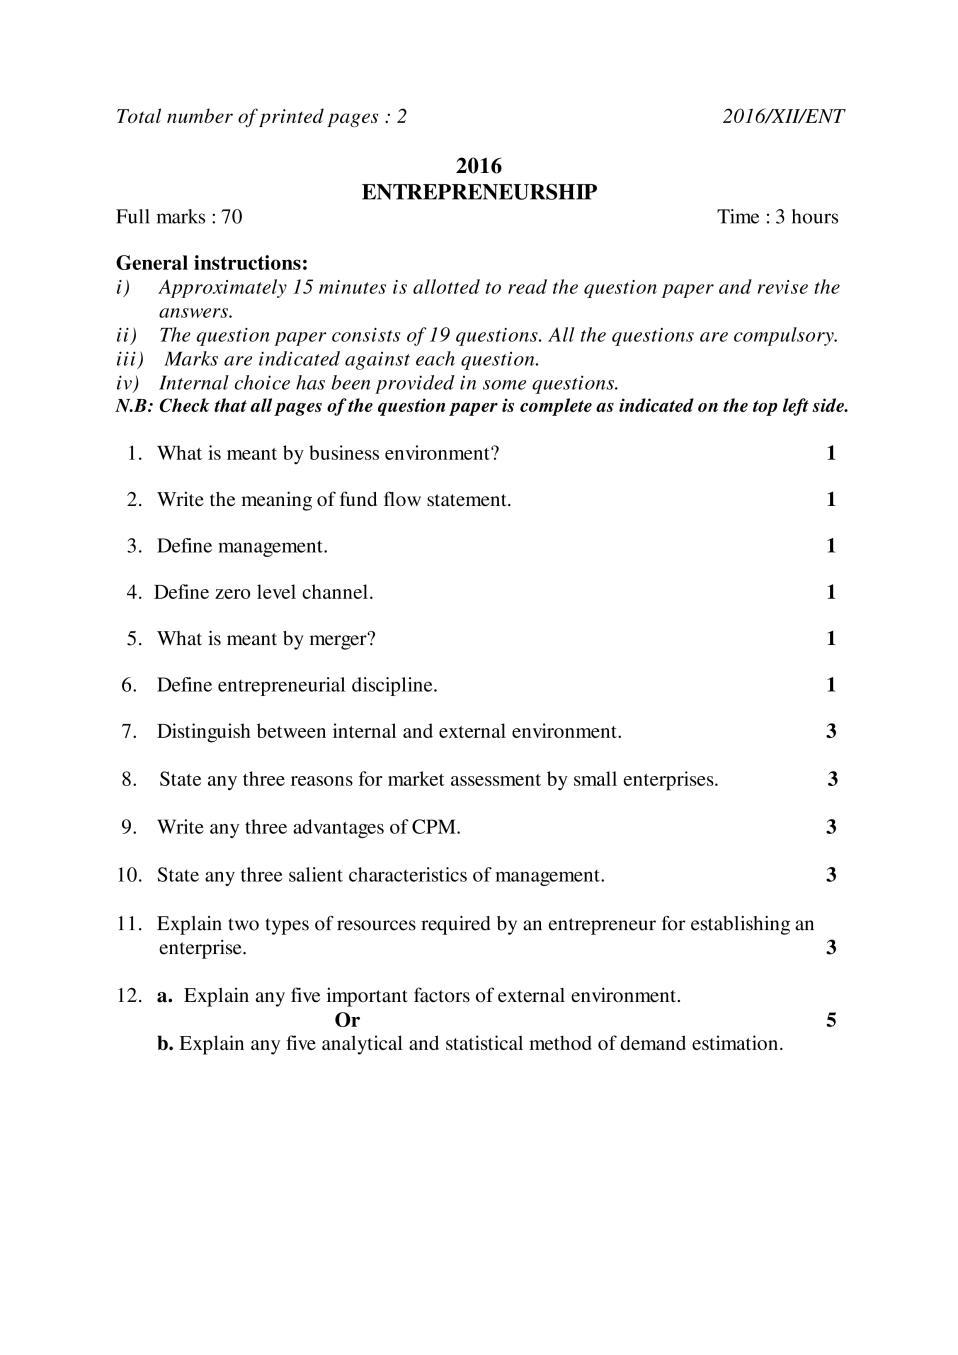 NBSE Class 12 Question Paper 2016 for Entrepreneurship - Page 1